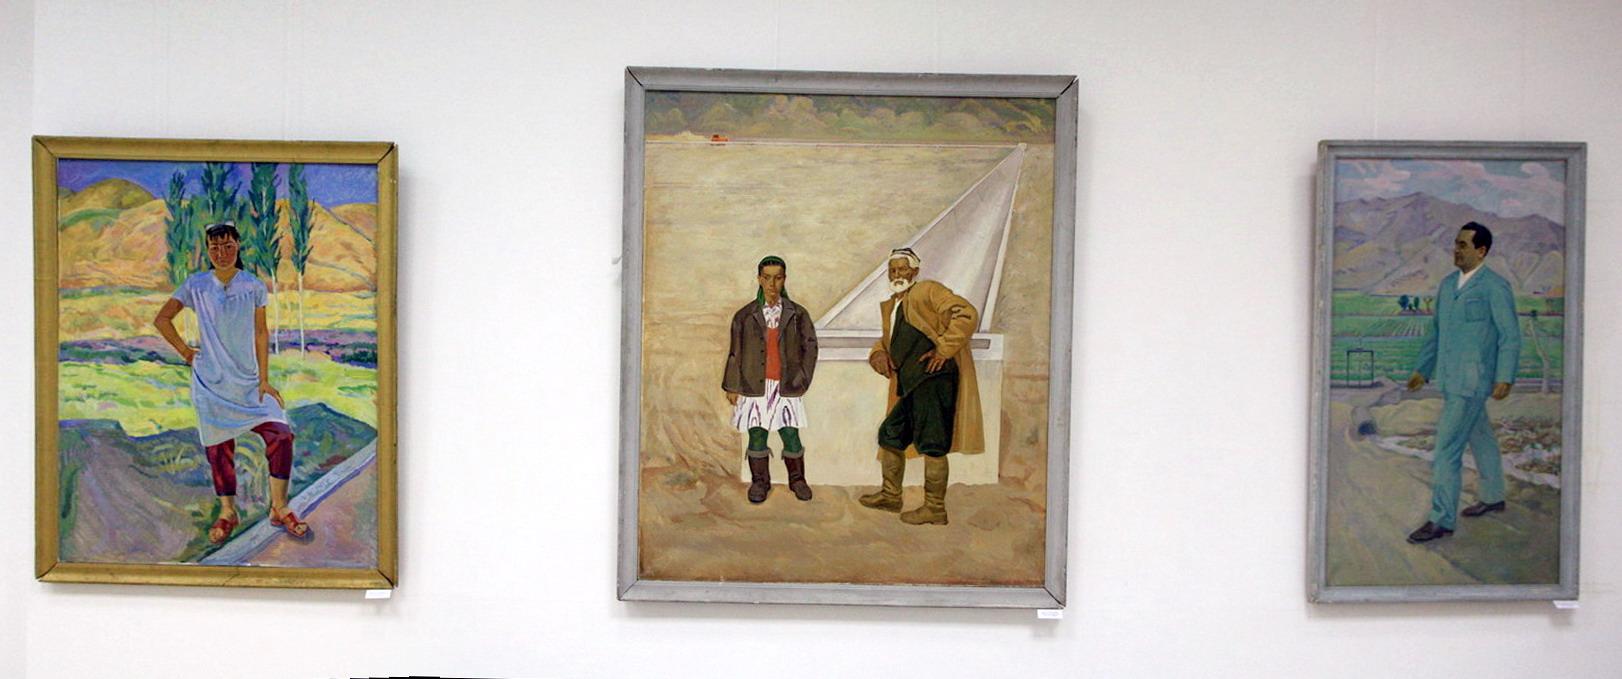 Бабаев Б. Экспозиция картин 1.